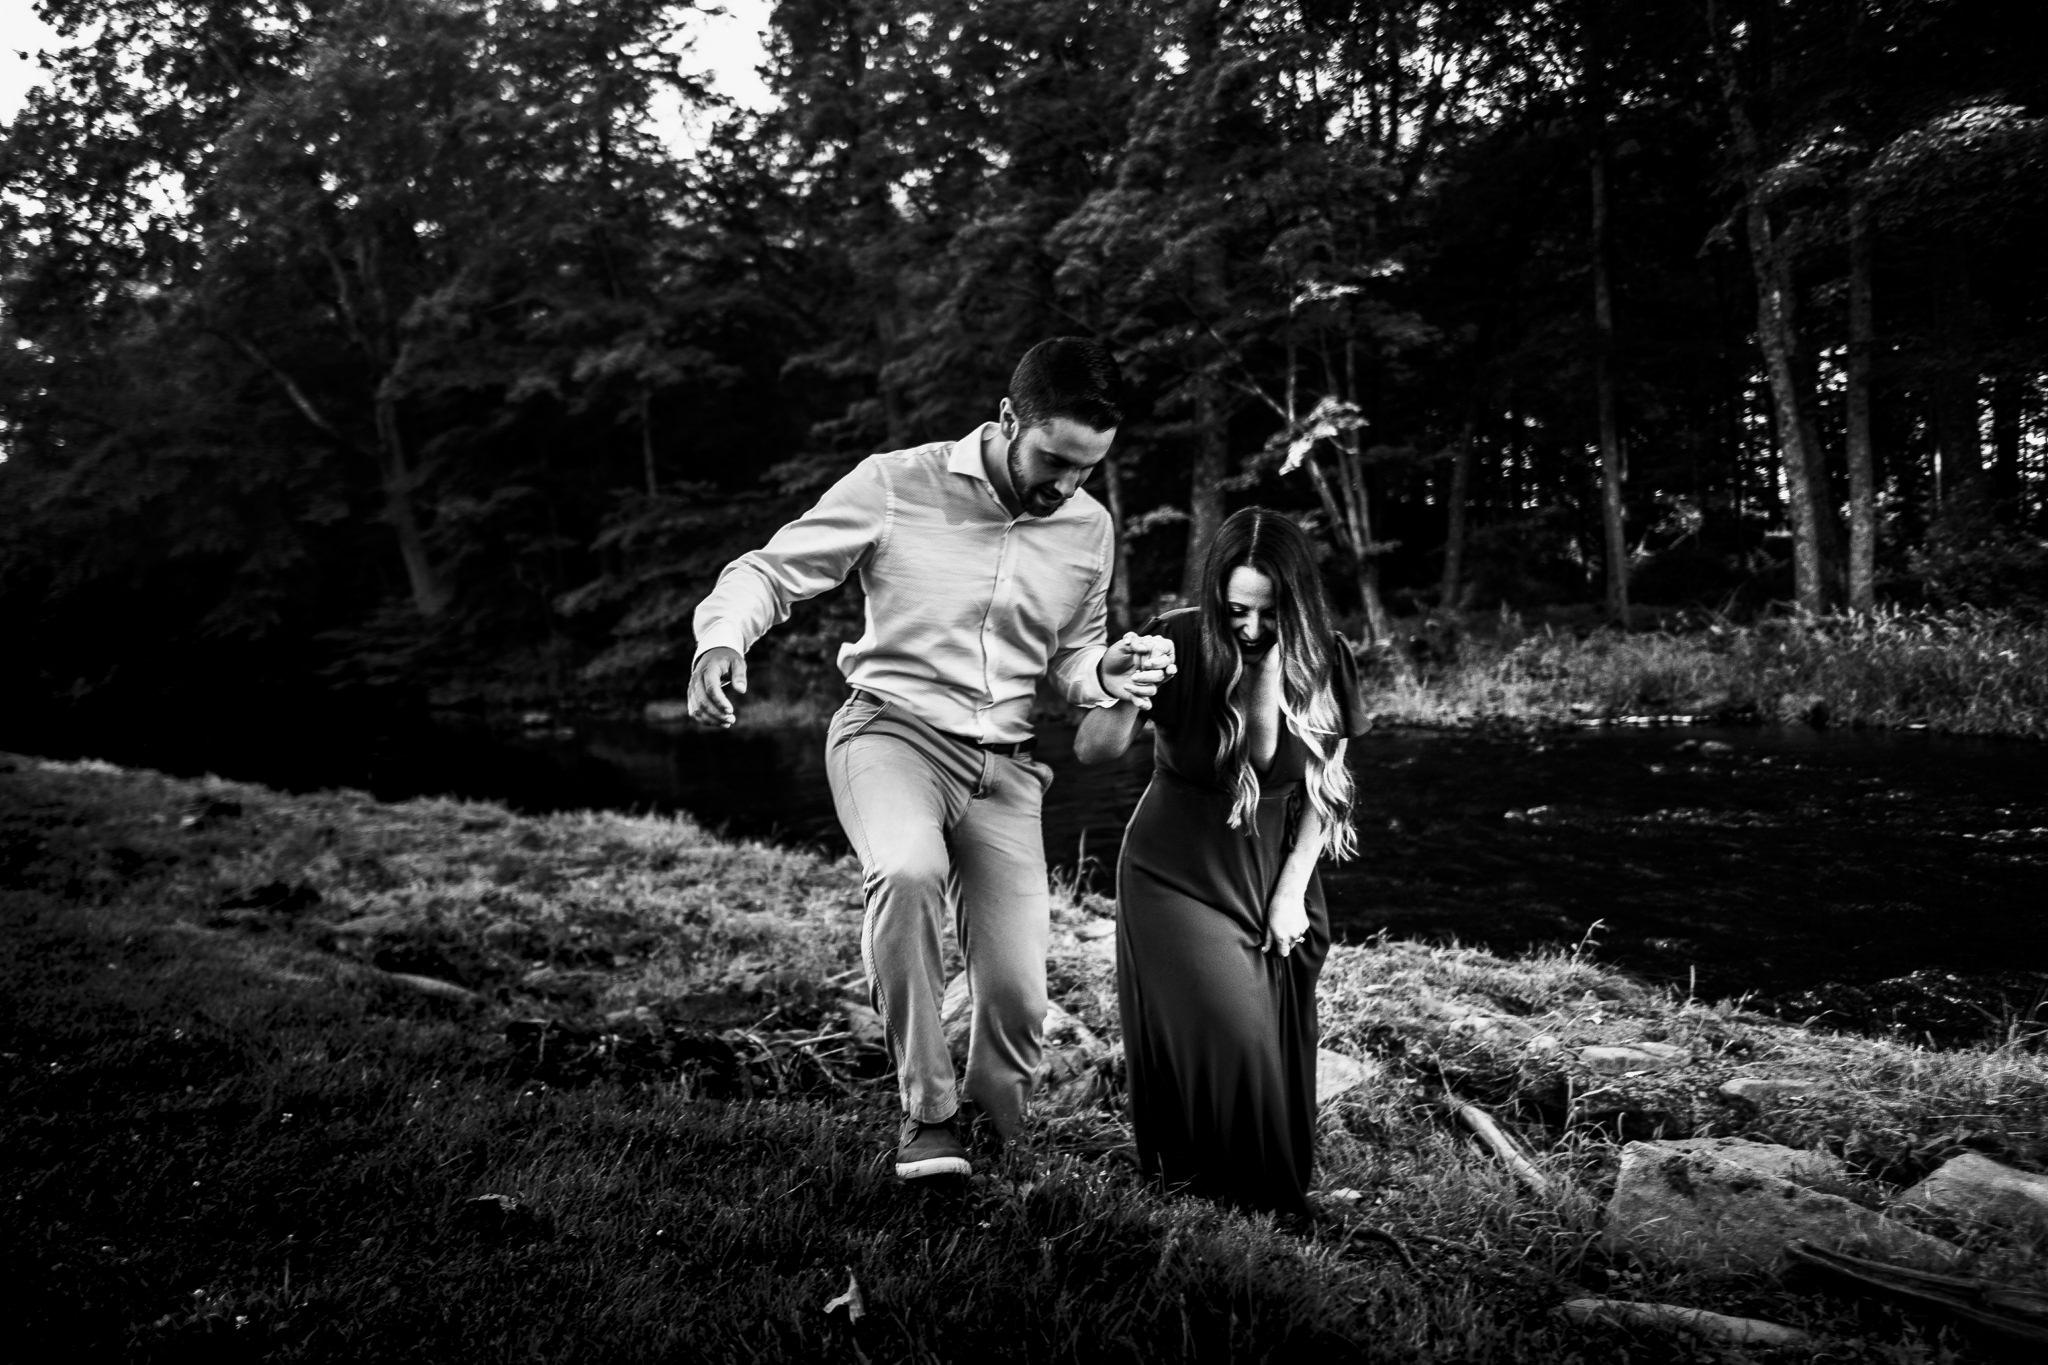 McKowen-Natirar-Park-Engagement-Photos-09.JPG